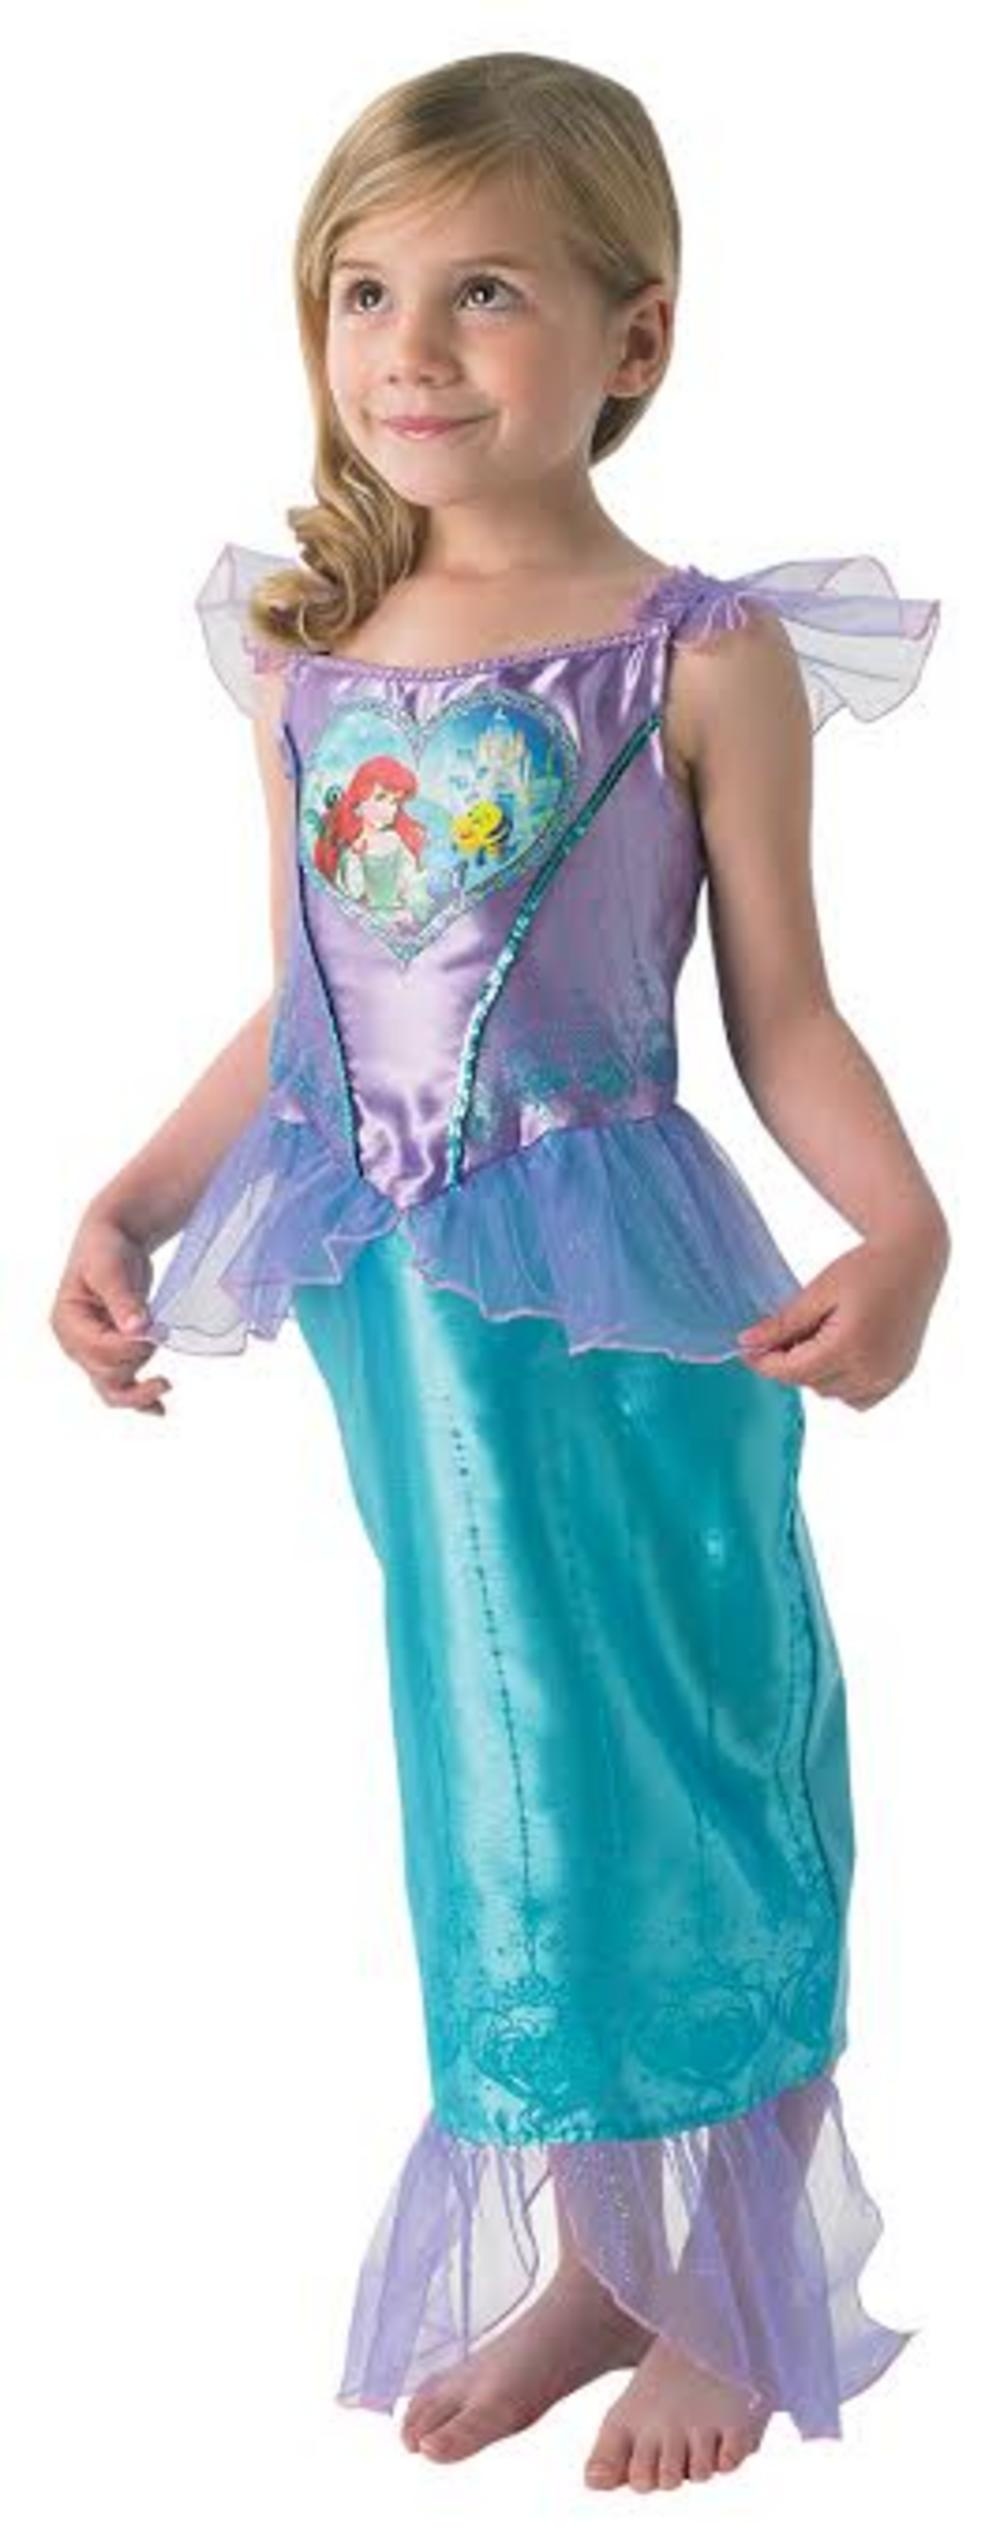 Loveheart Ariel Costume